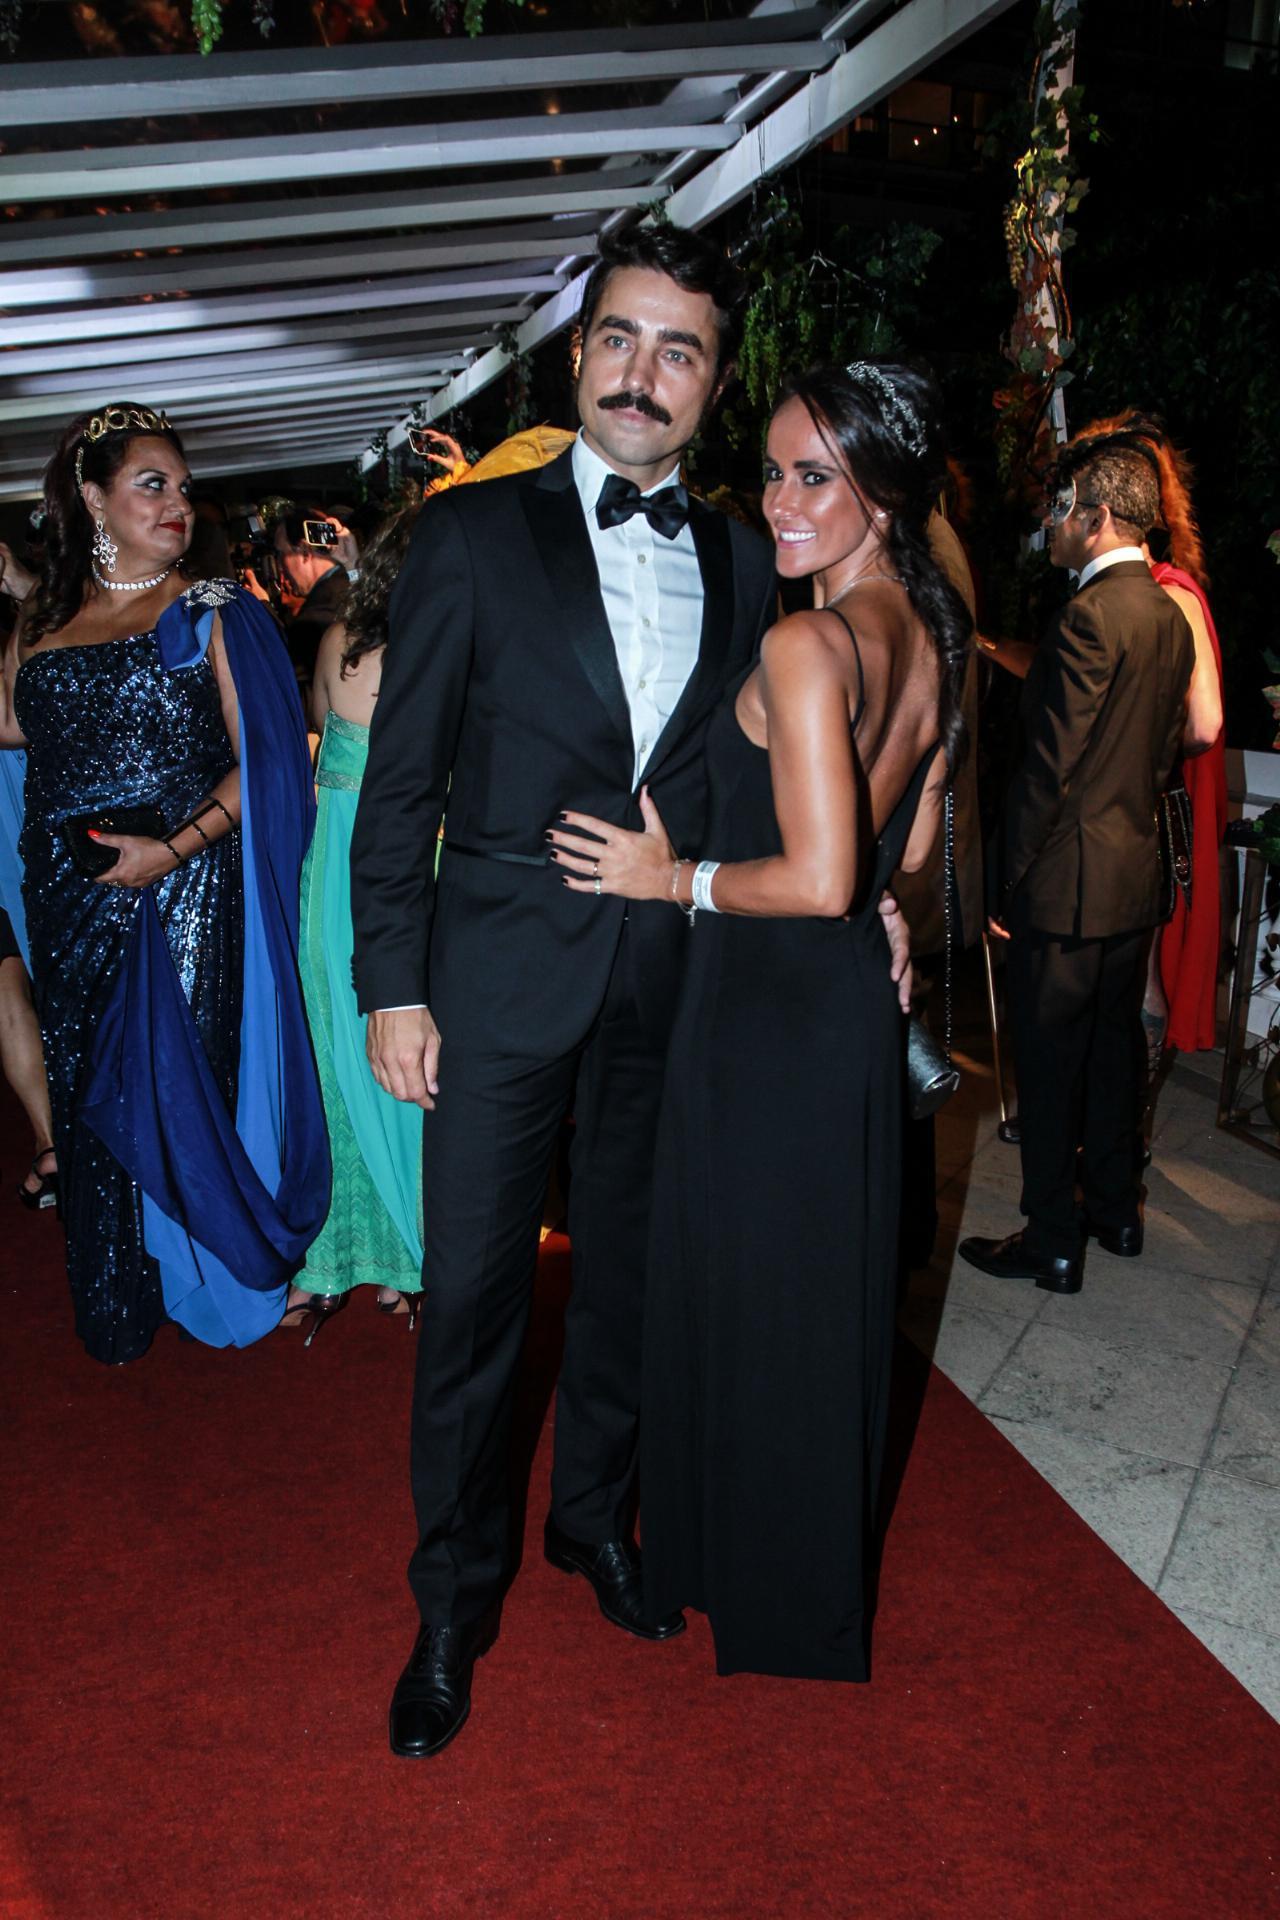 83647_baile_de_carnaval_do_copacabana_palace_exclusivo_g_resized_resized